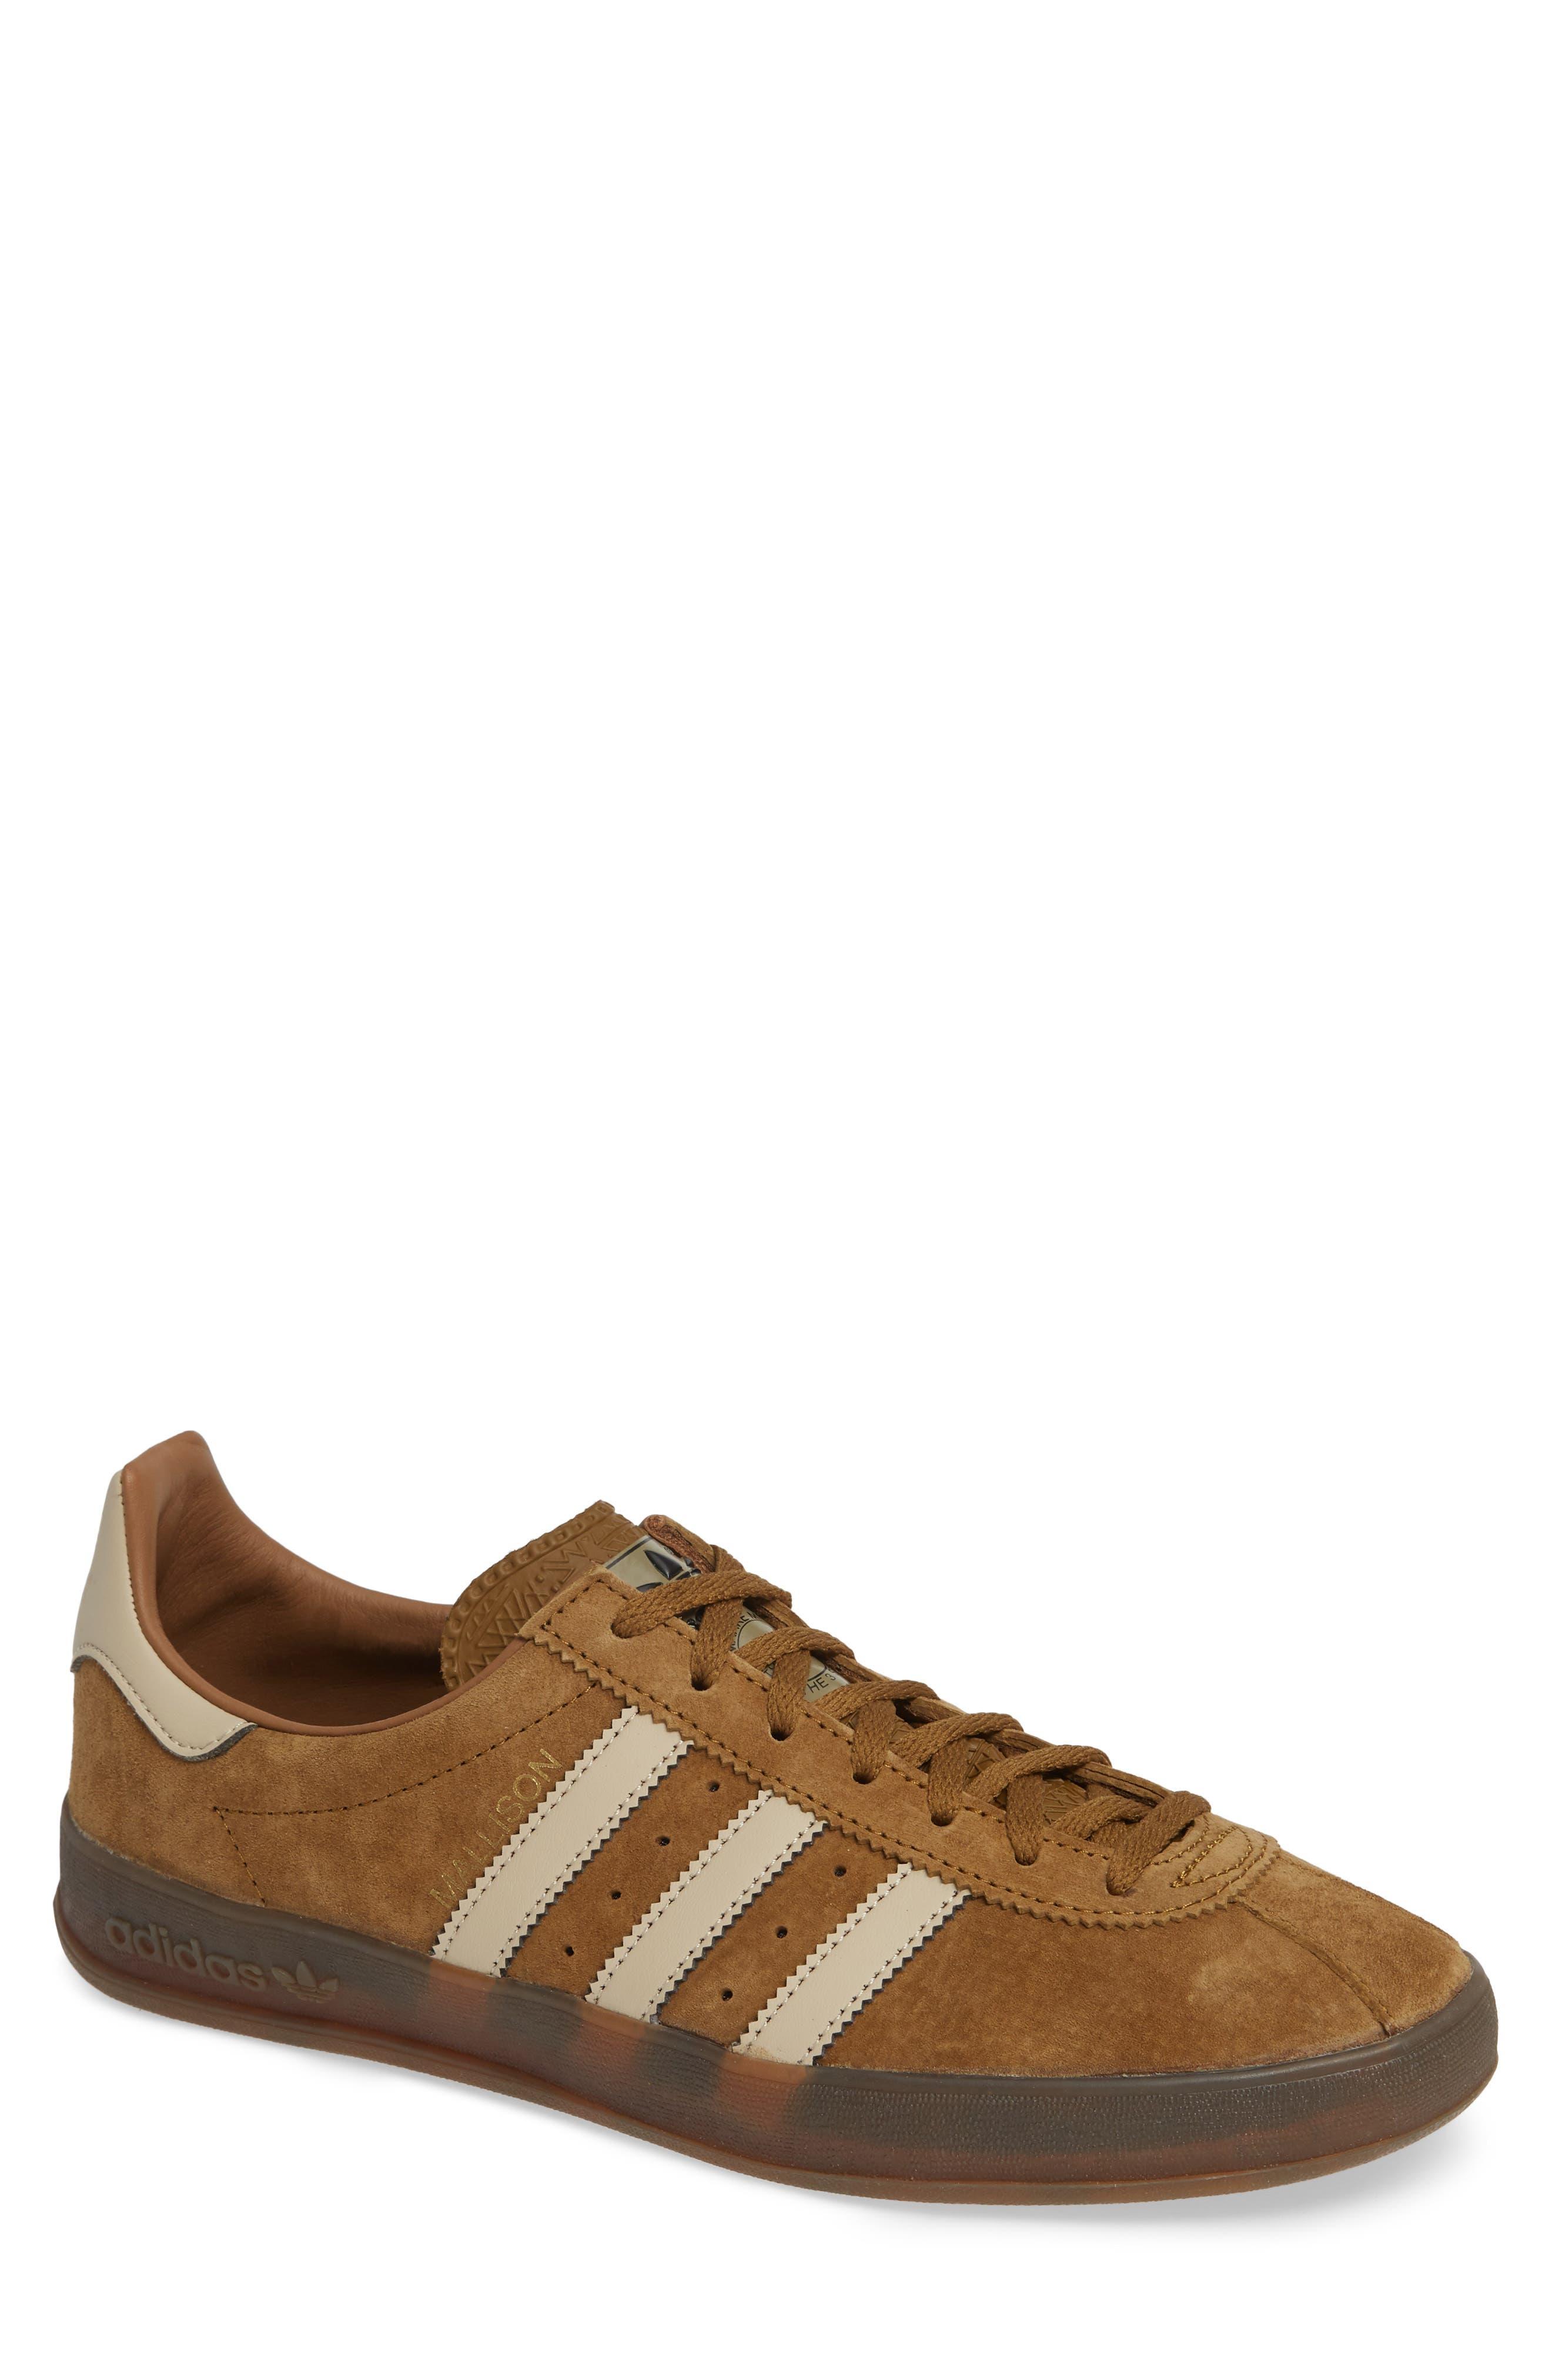 ADIDAS Mallison SPZL Low Top Sneaker, Main, color, 200